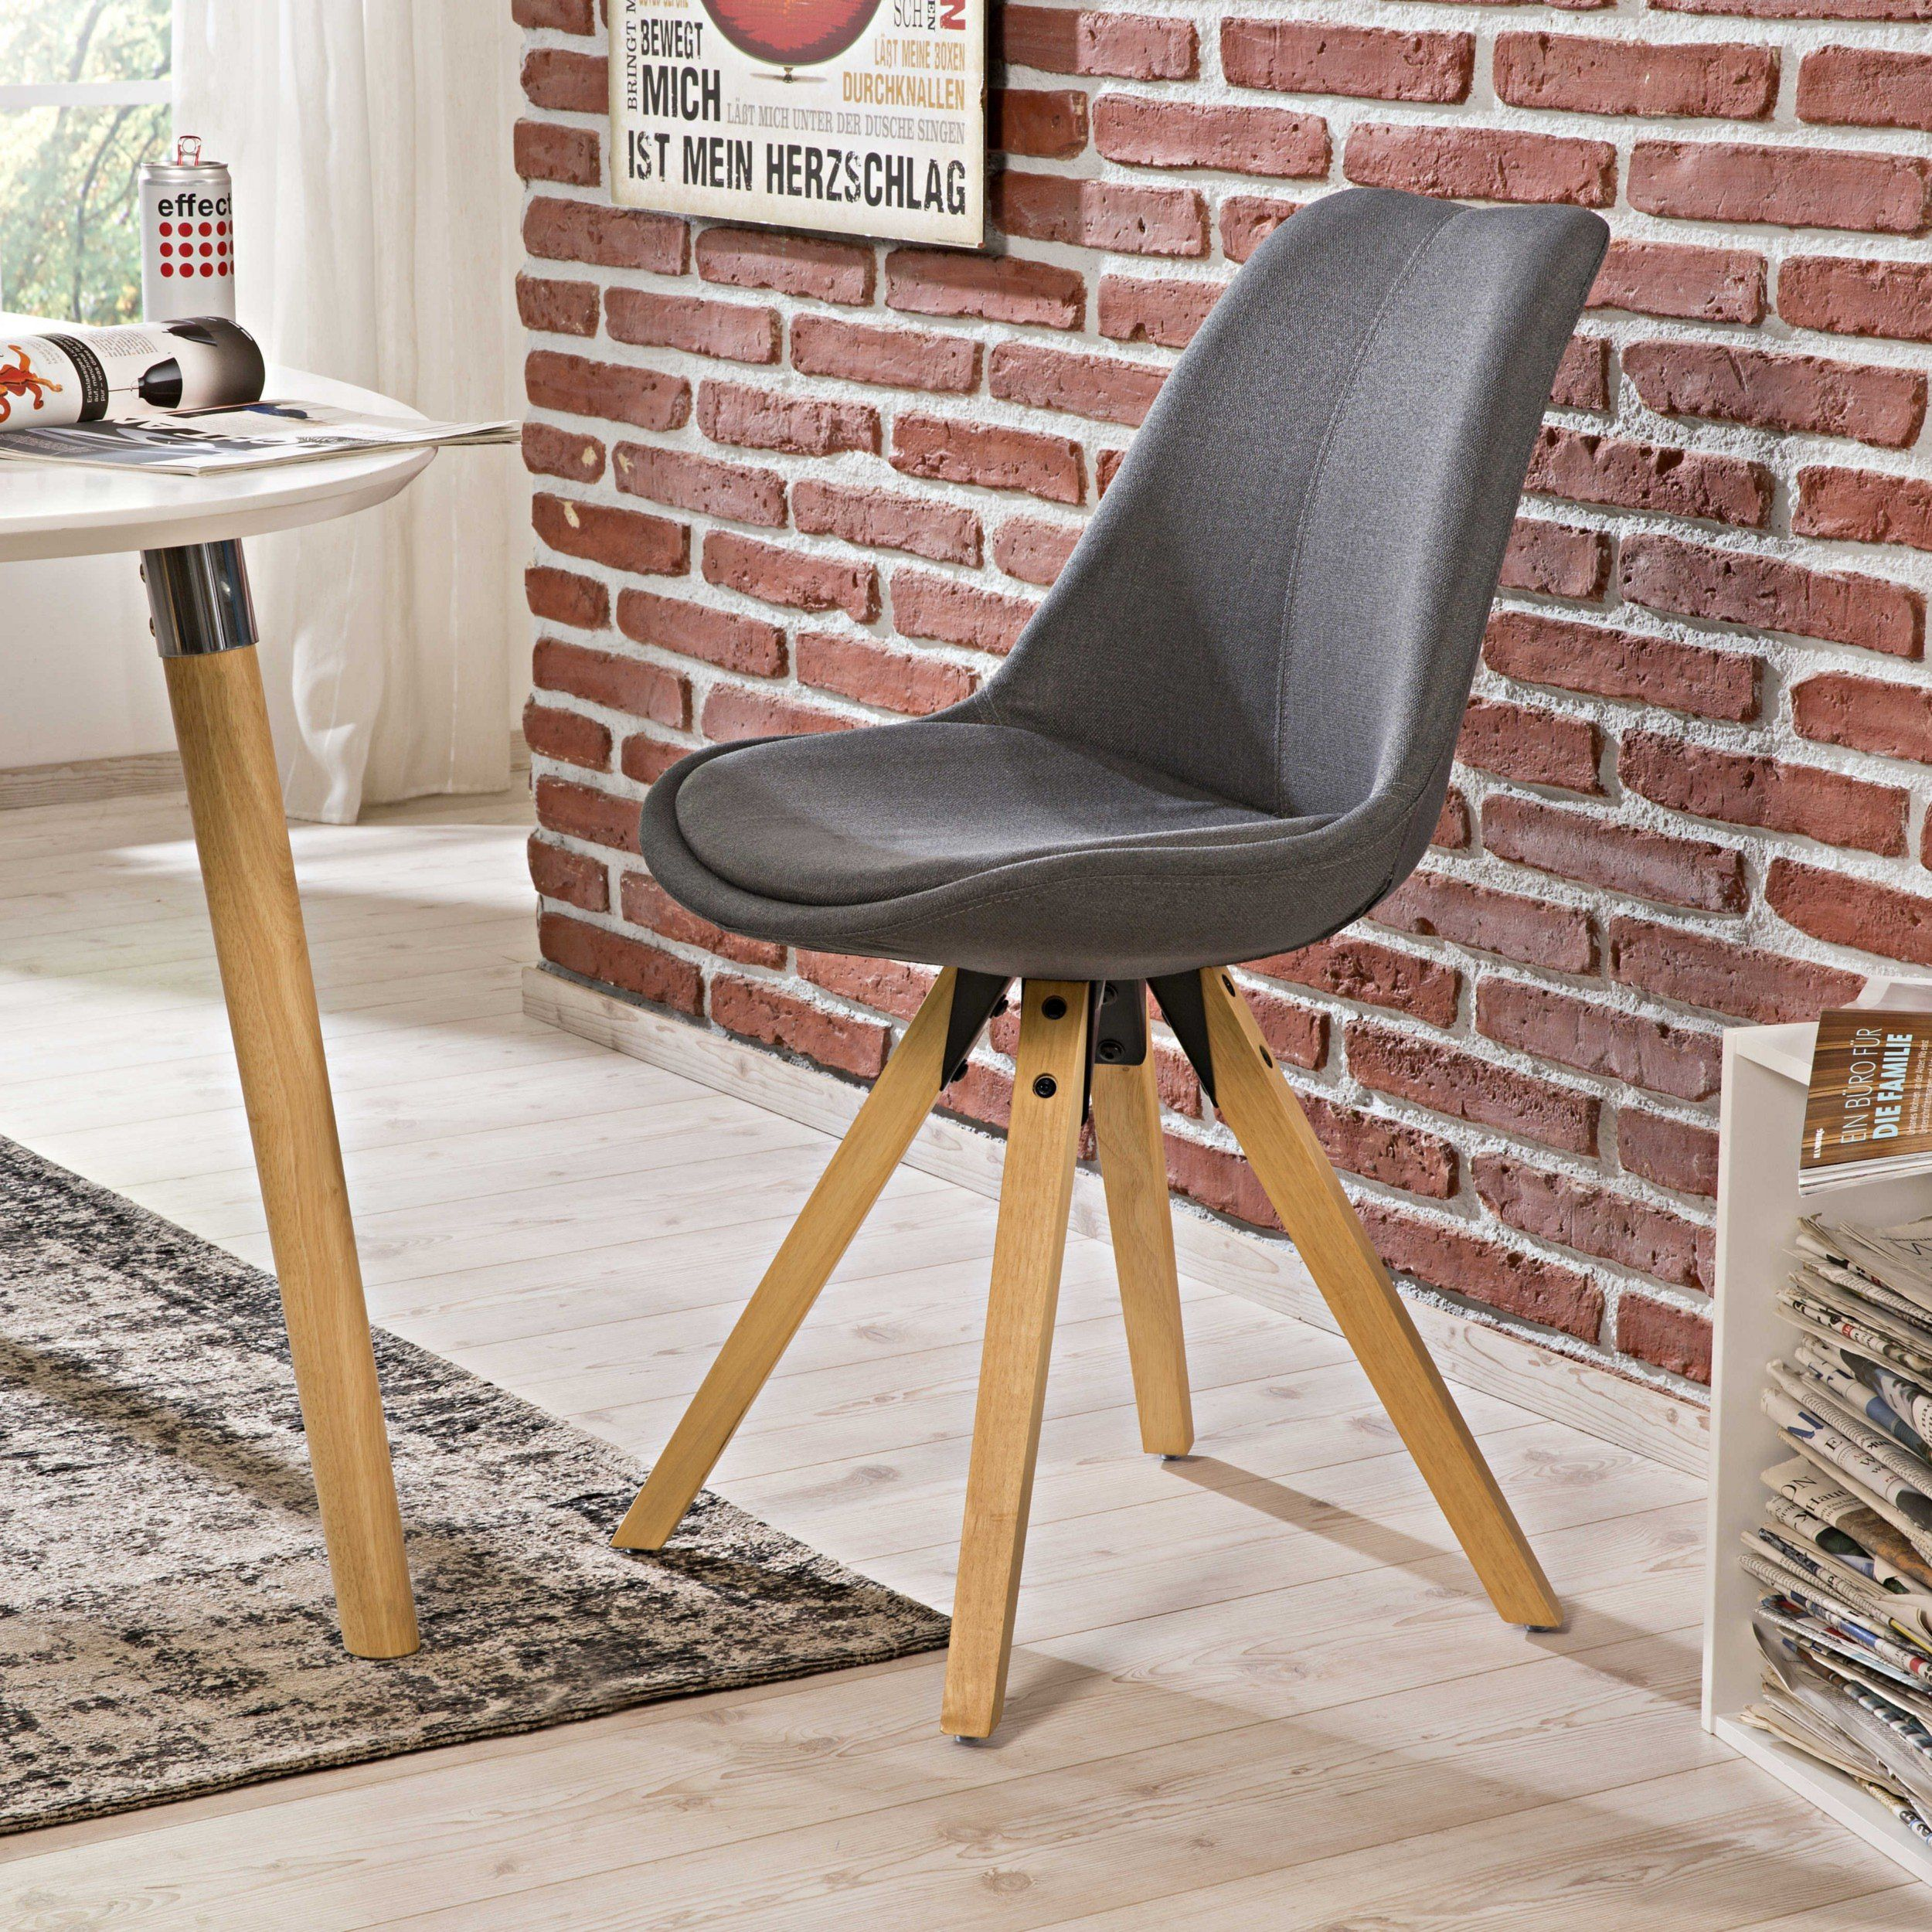 Stuehle line Simple Giulio Iacchetti Stia Chair With Stuehle